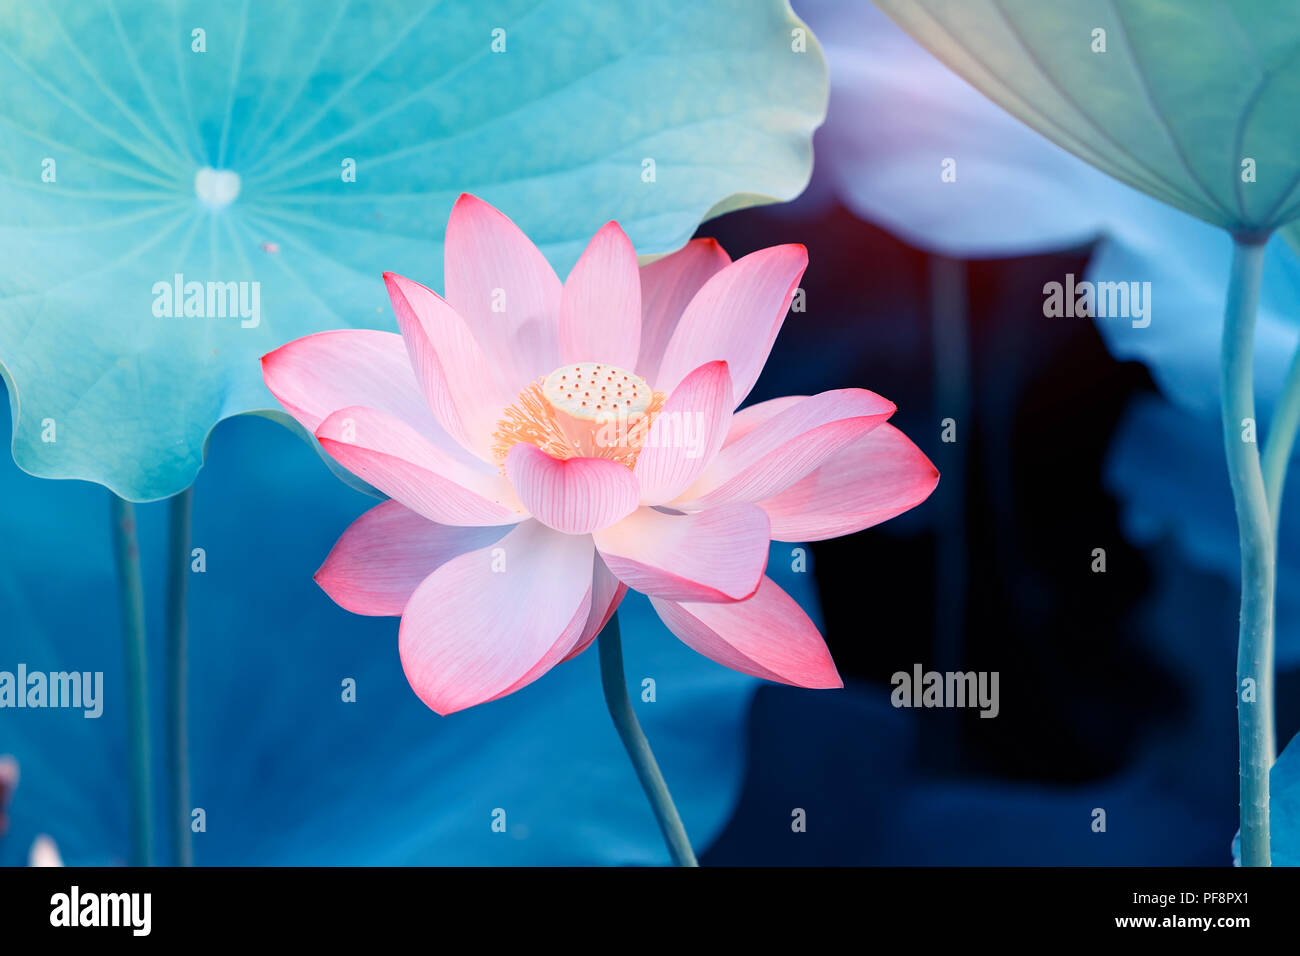 Lotus Flower And Lotus Flower Plants Stock Photo 215937849 Alamy